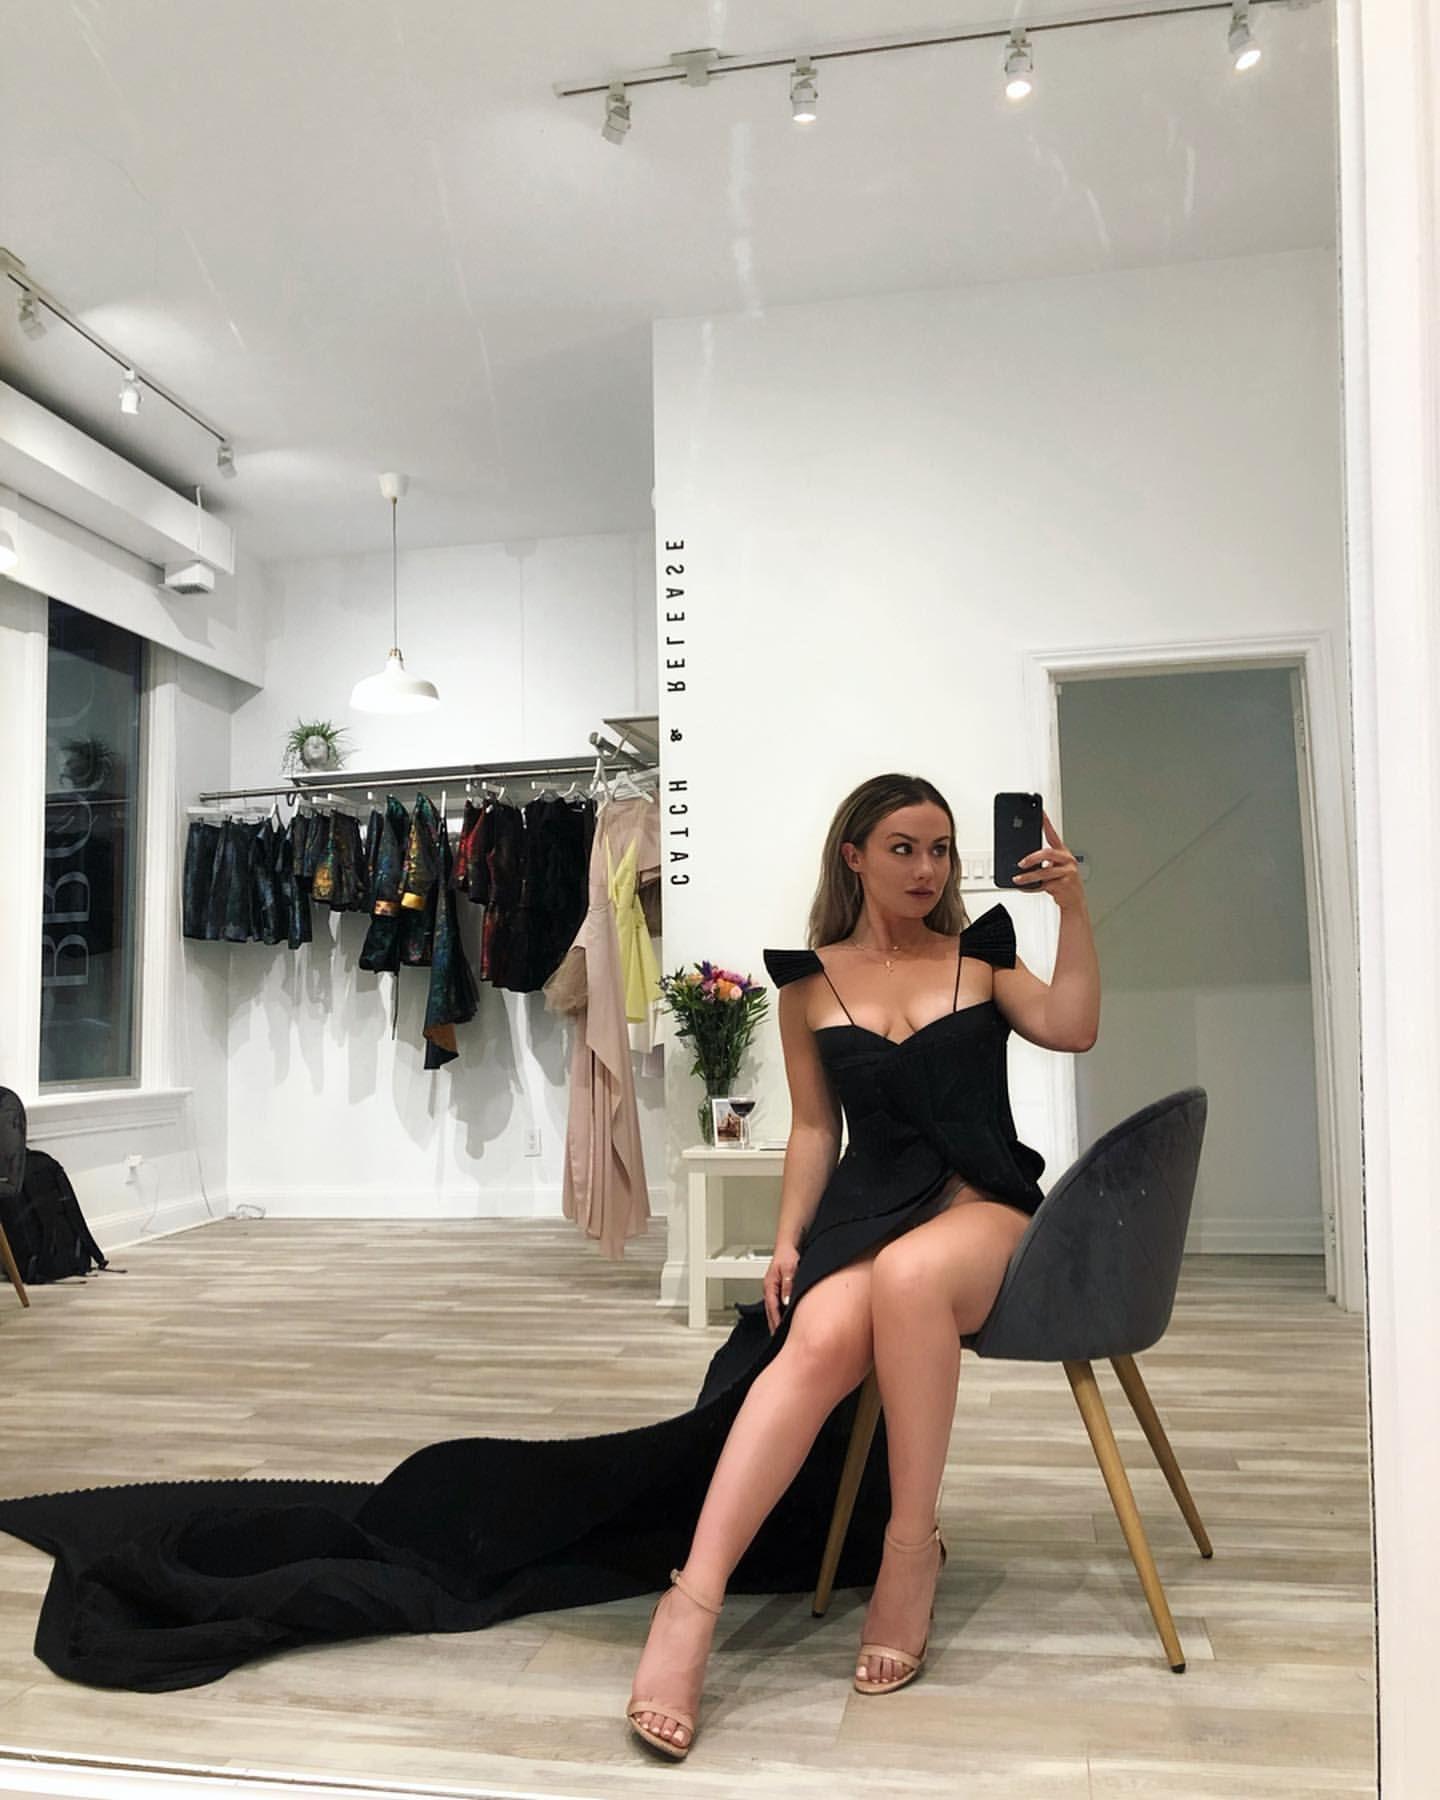 Celeste Bouchard Nude Leaked The Fappening 0025